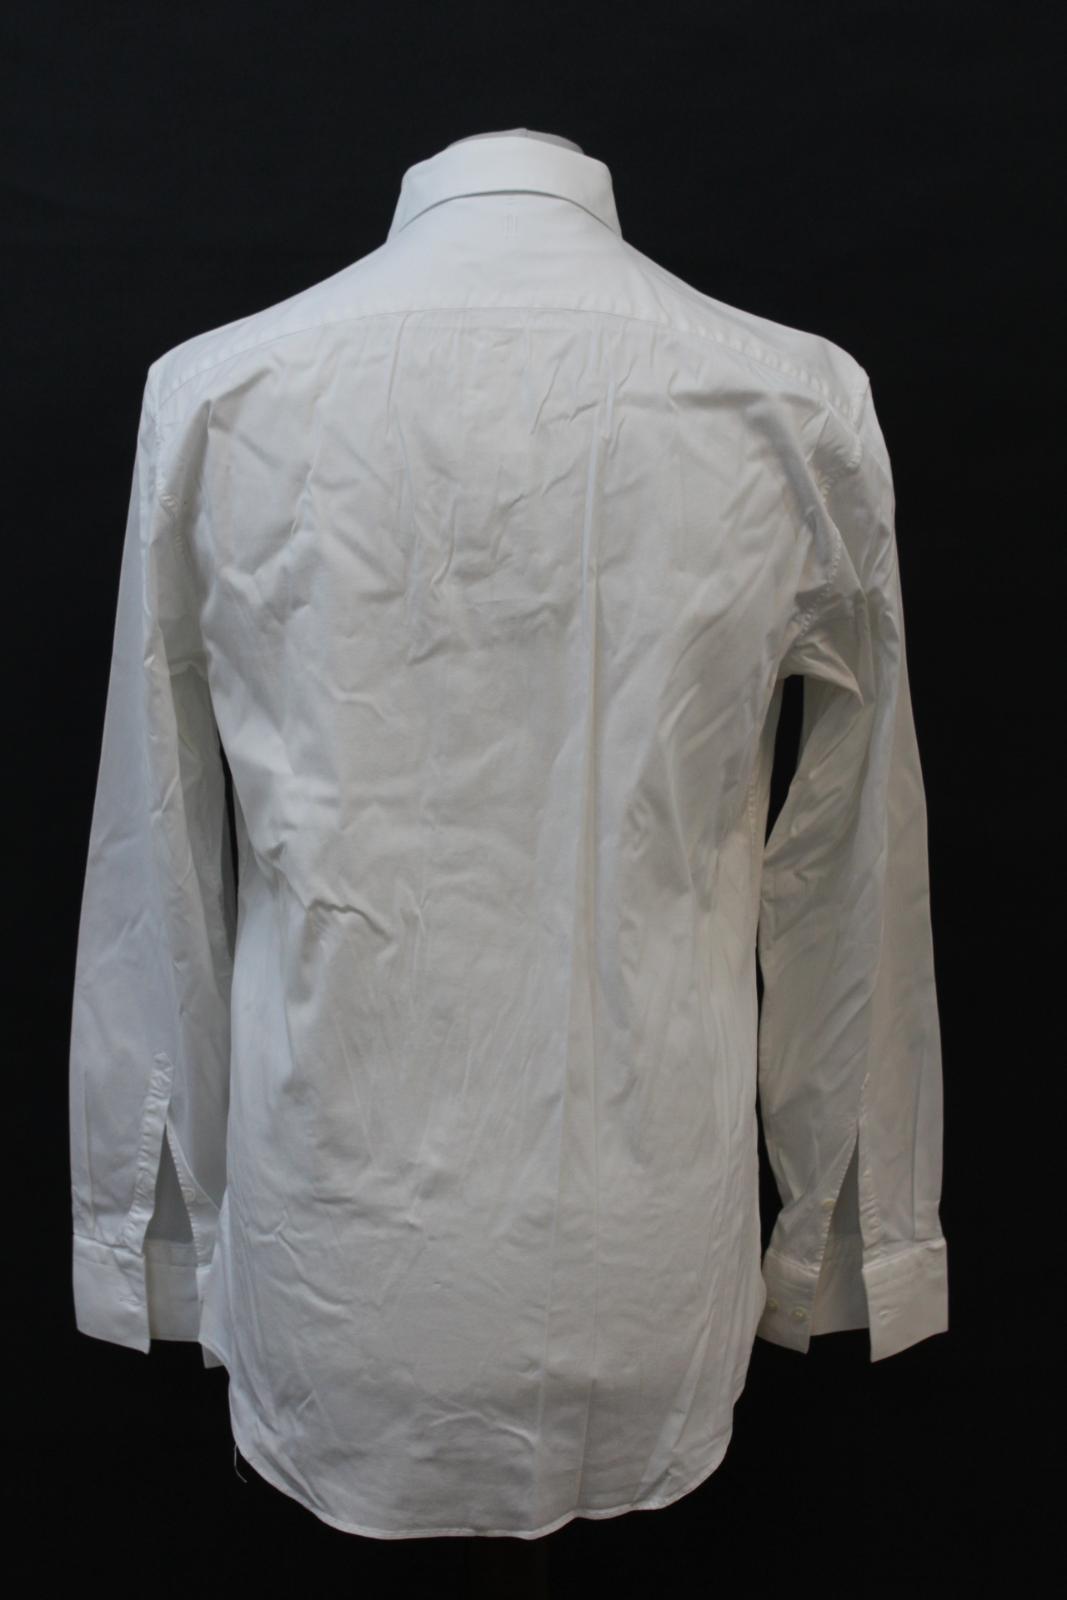 NEIL-BARRETT-Men-039-s-White-Cotton-Blend-Slim-Fit-Formal-Shirt-Collar-16-5-034-42cm miniatura 5